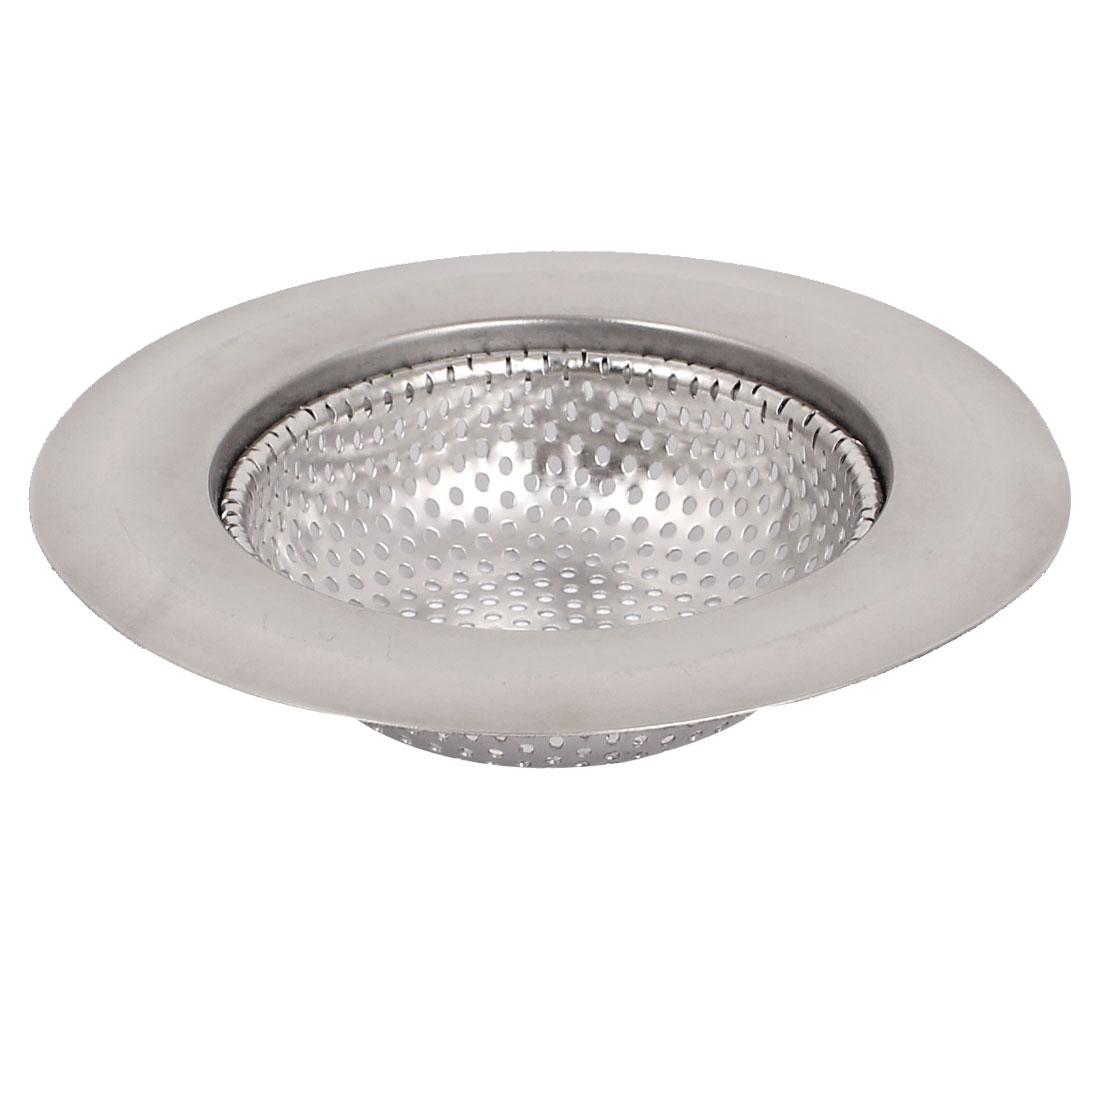 Silver Tone Metal Sink Strainer Mesh Basket Drain Net Bathtub Protector for Bathroom Kitchen